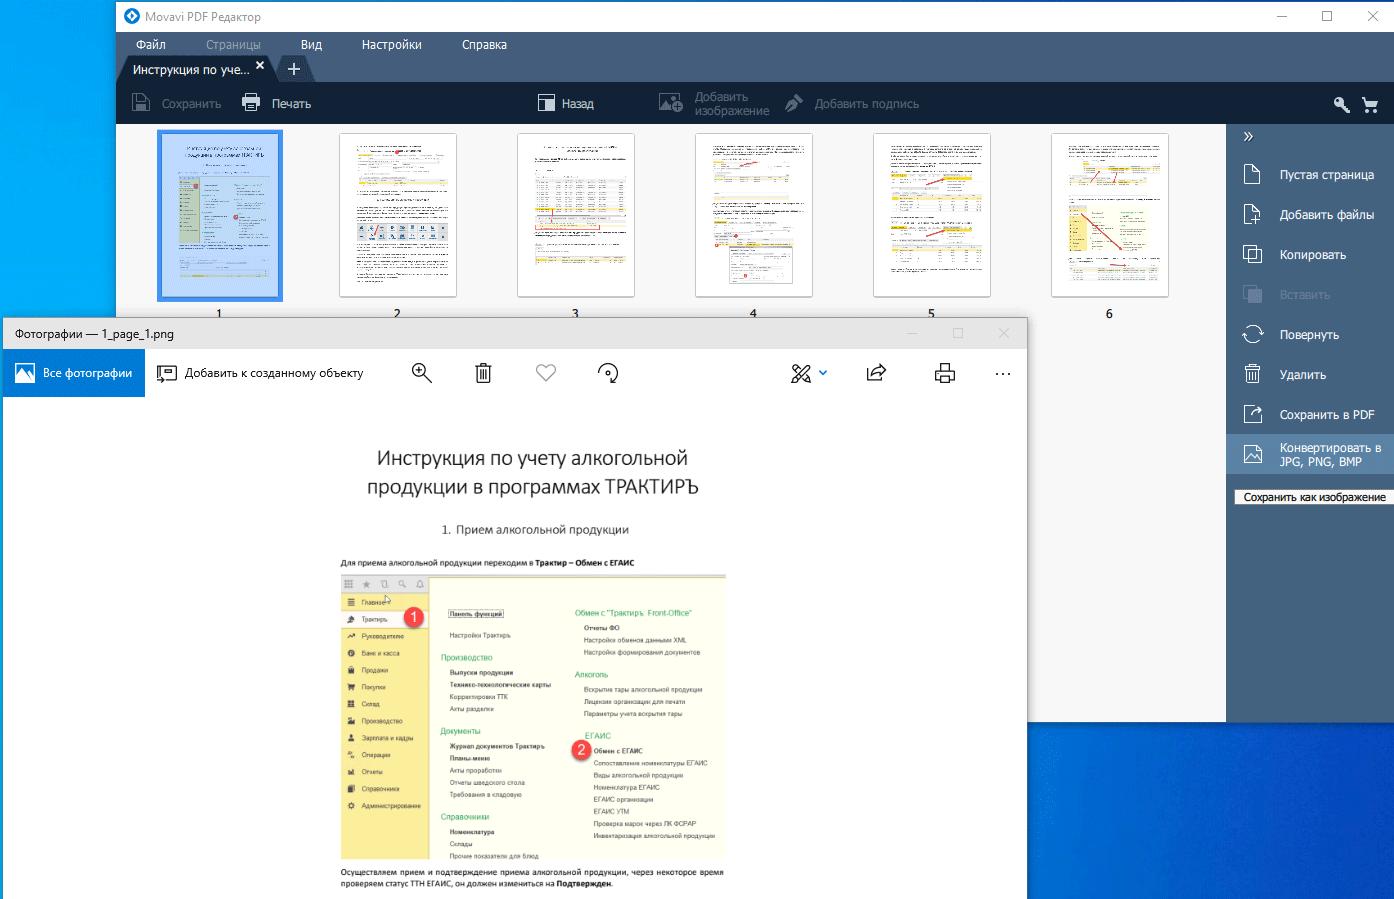 https://interface31.ru/tech_it/images/Movavi-PDF-editor-005.png